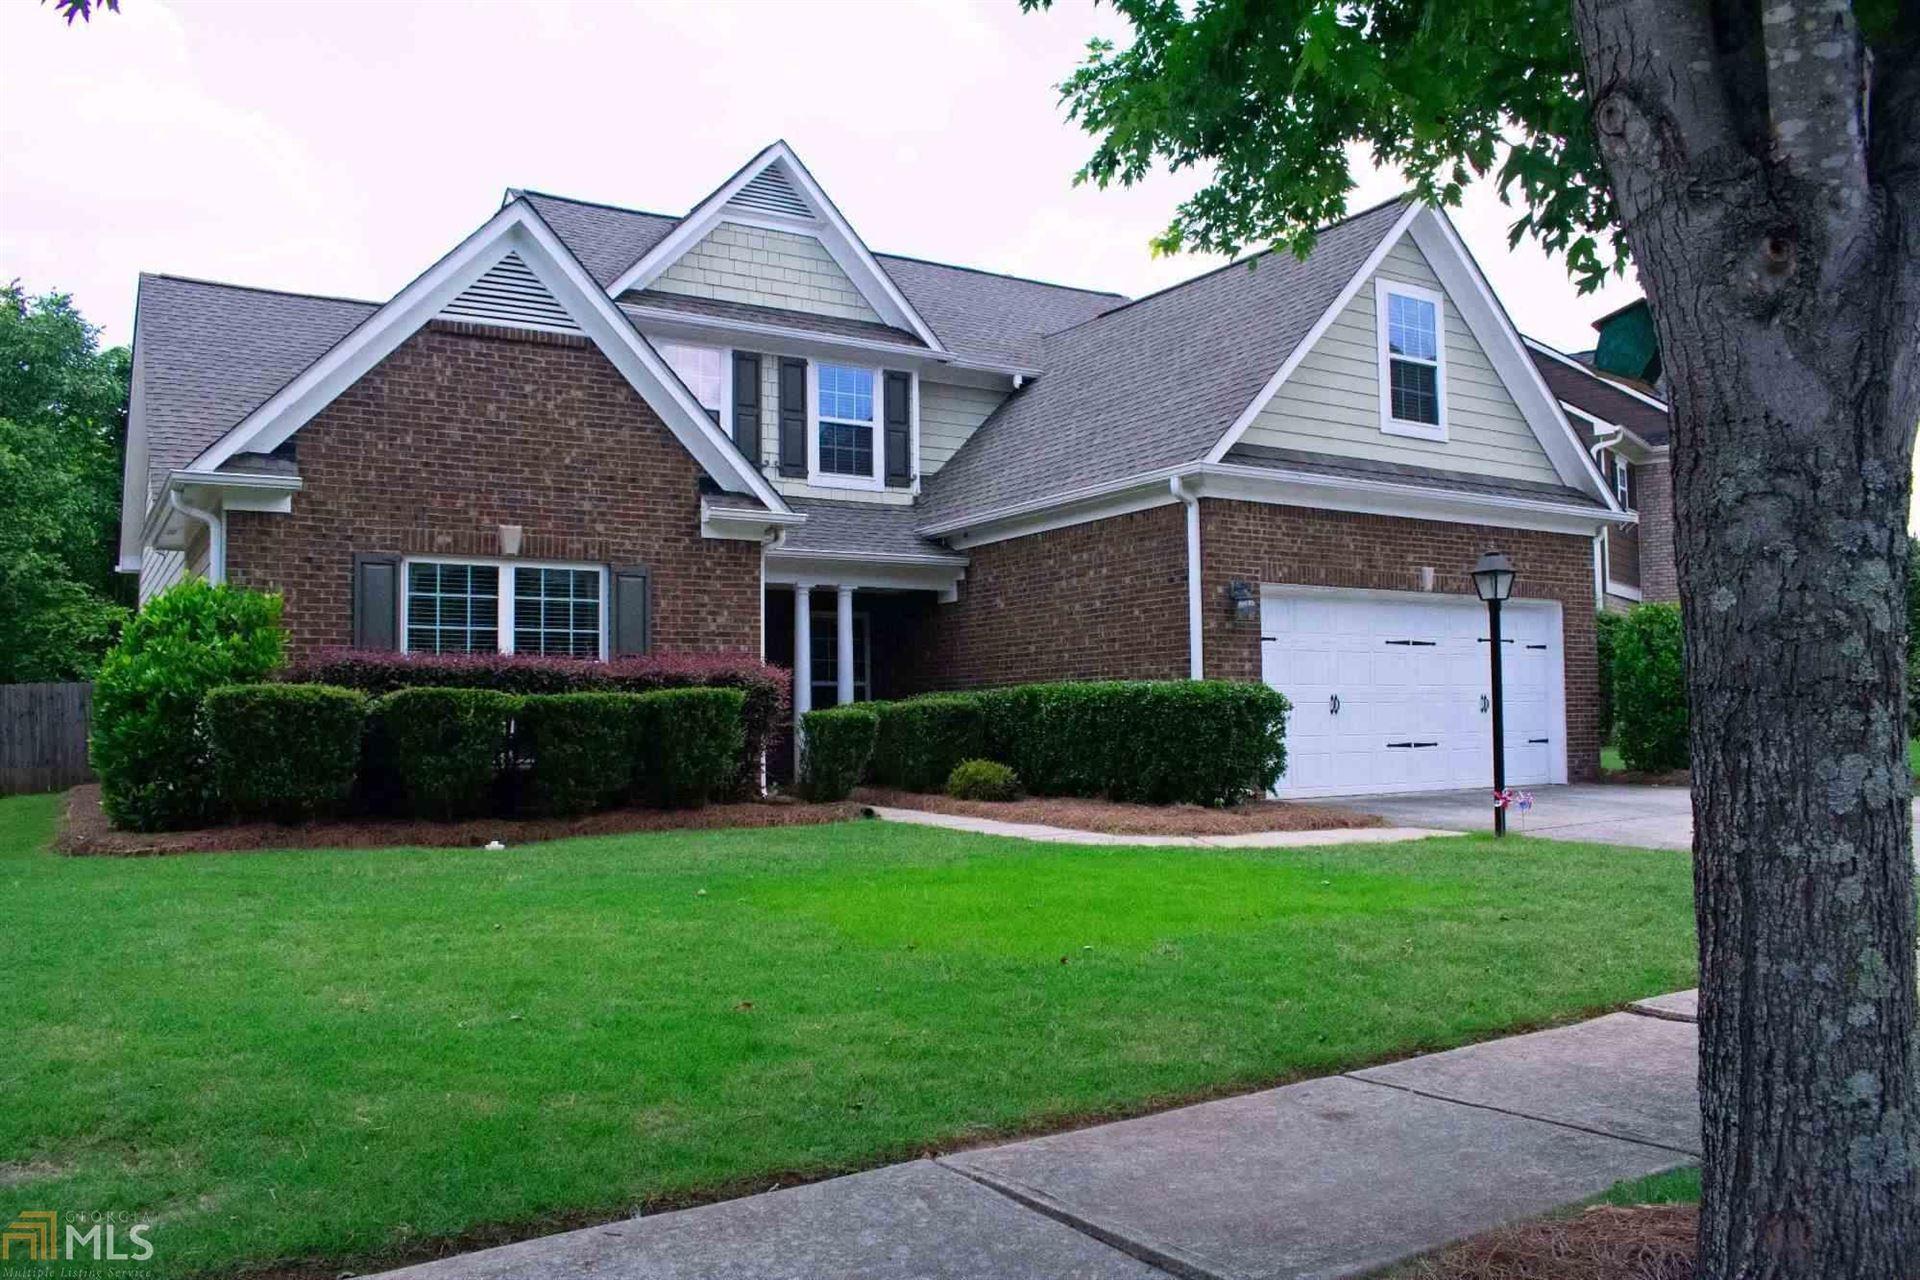 355 Roland Manor Dr, Dacula, GA 30019 - MLS#: 8812018